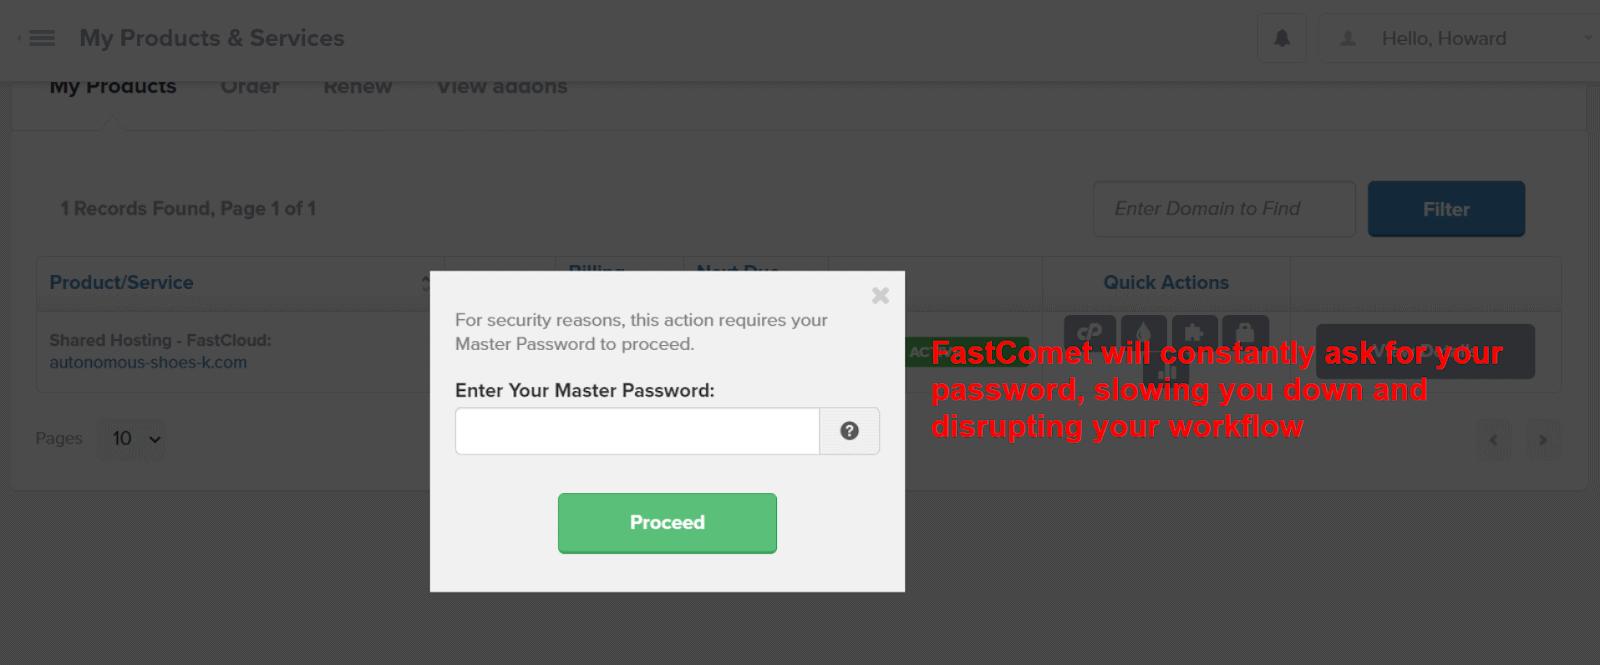 FastComet interface - password verification